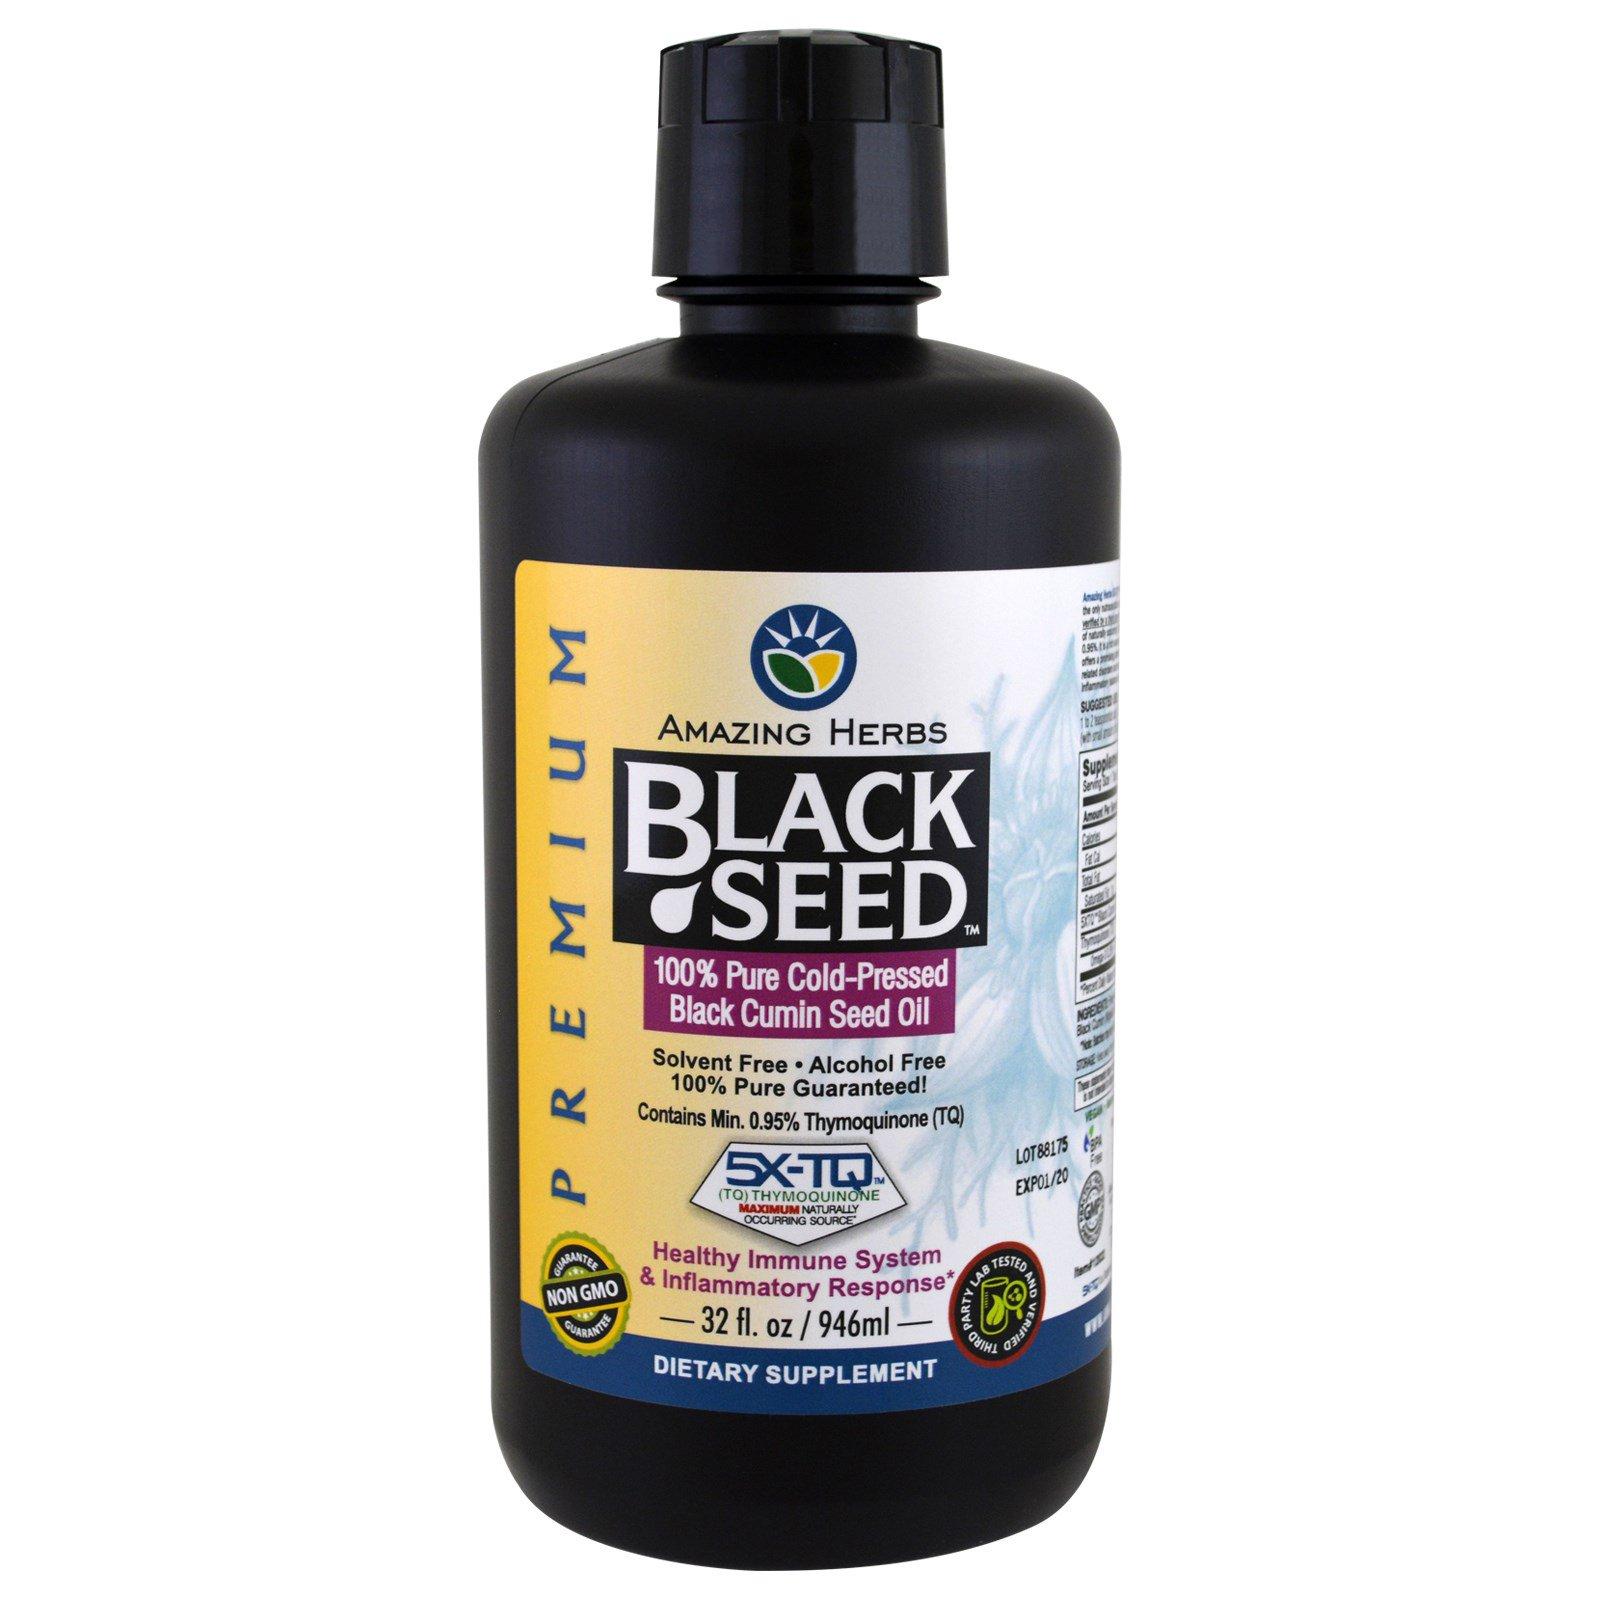 Amazing Herbs, Black Seed, 100% Pure Cold-Pressed Black Cumin Seed Oil, 32 fl oz (946ml)